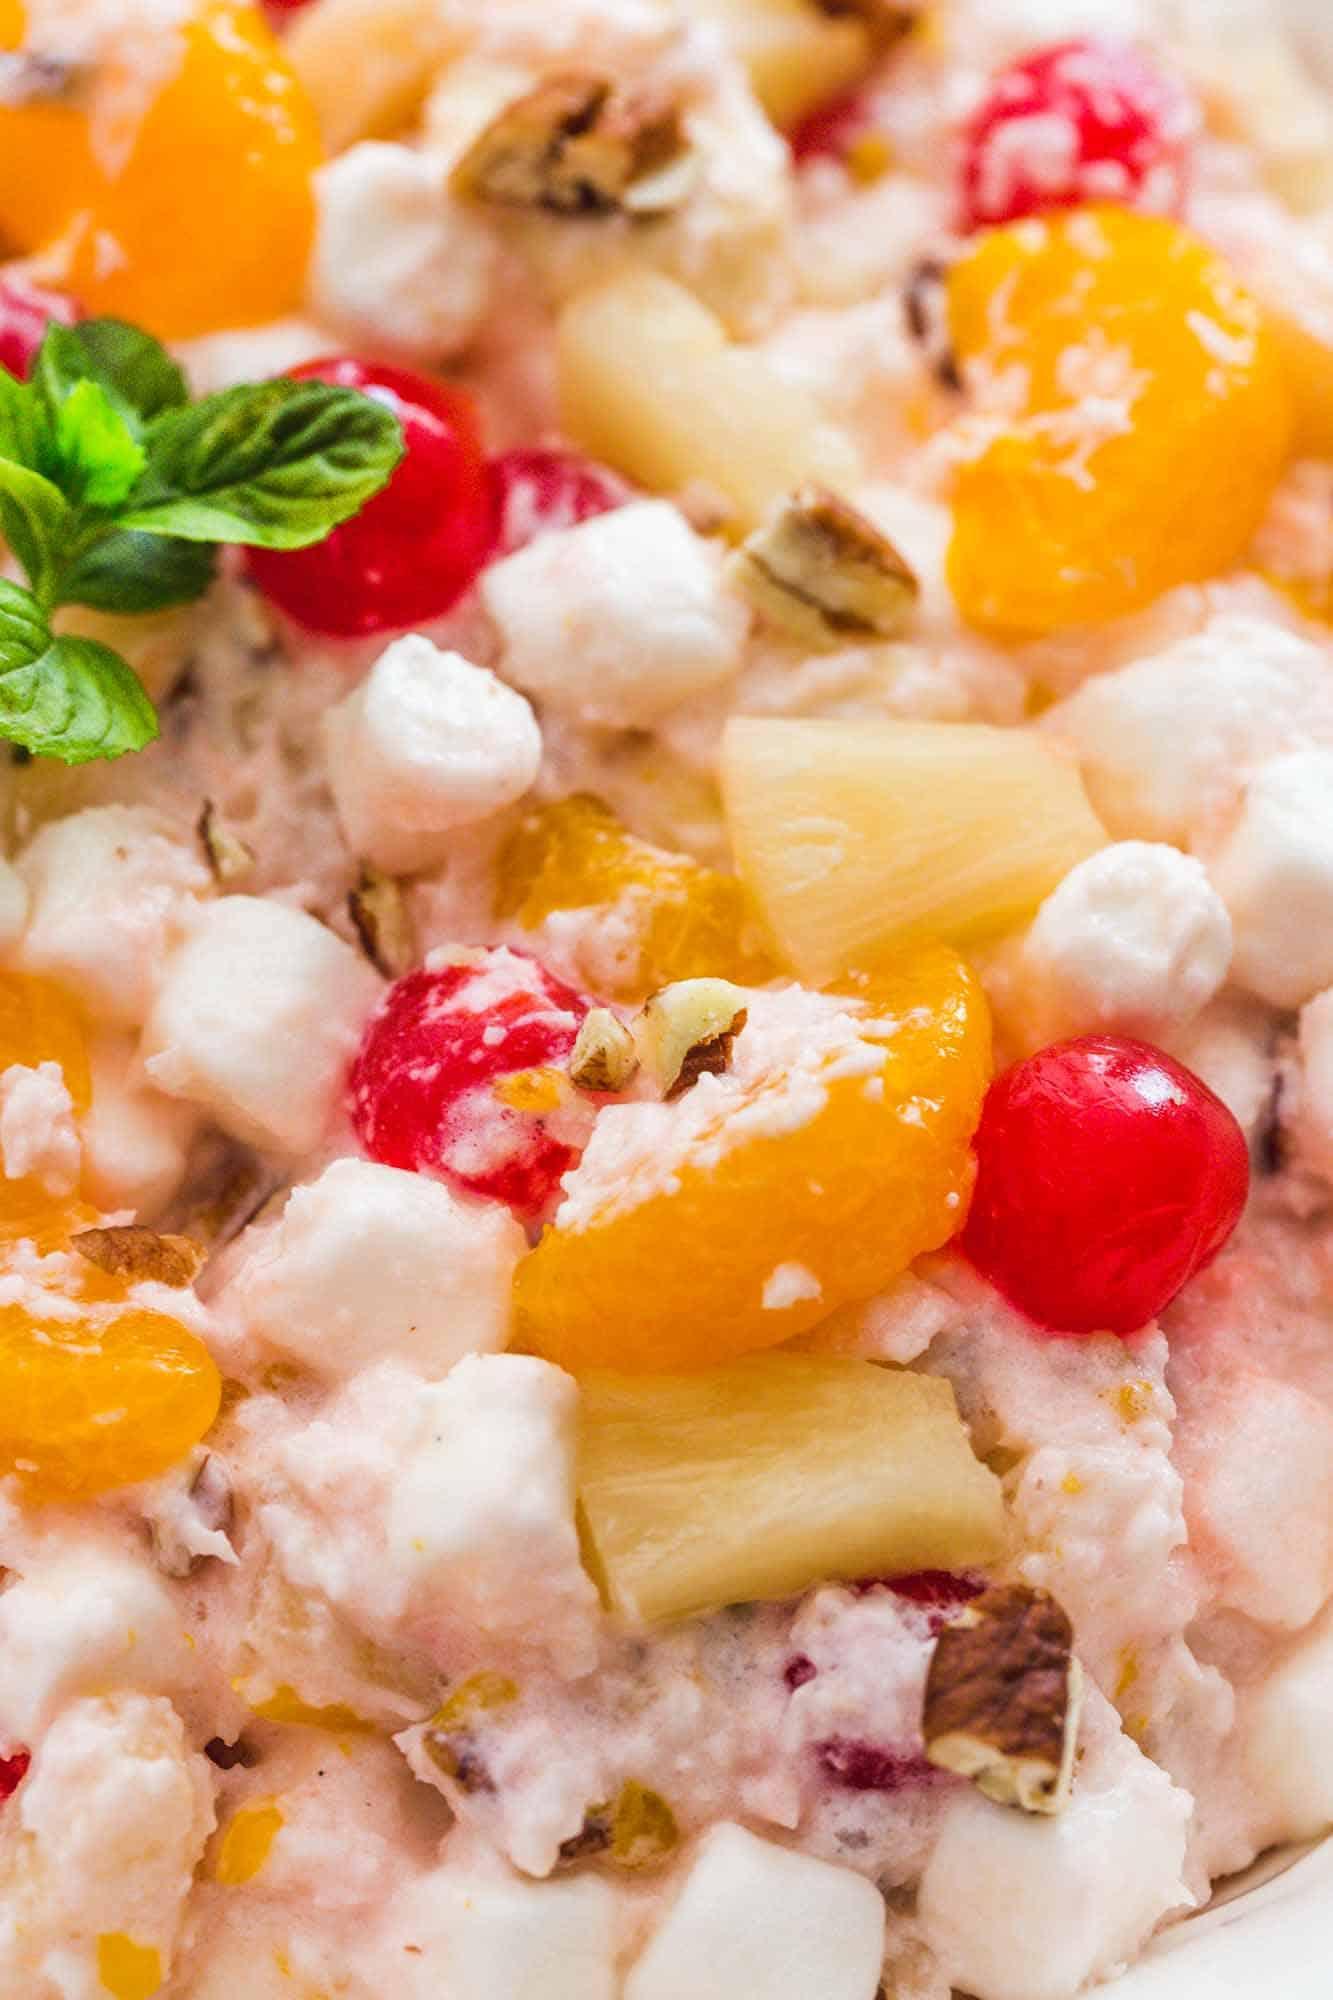 Close up shot of Ambrosia salad